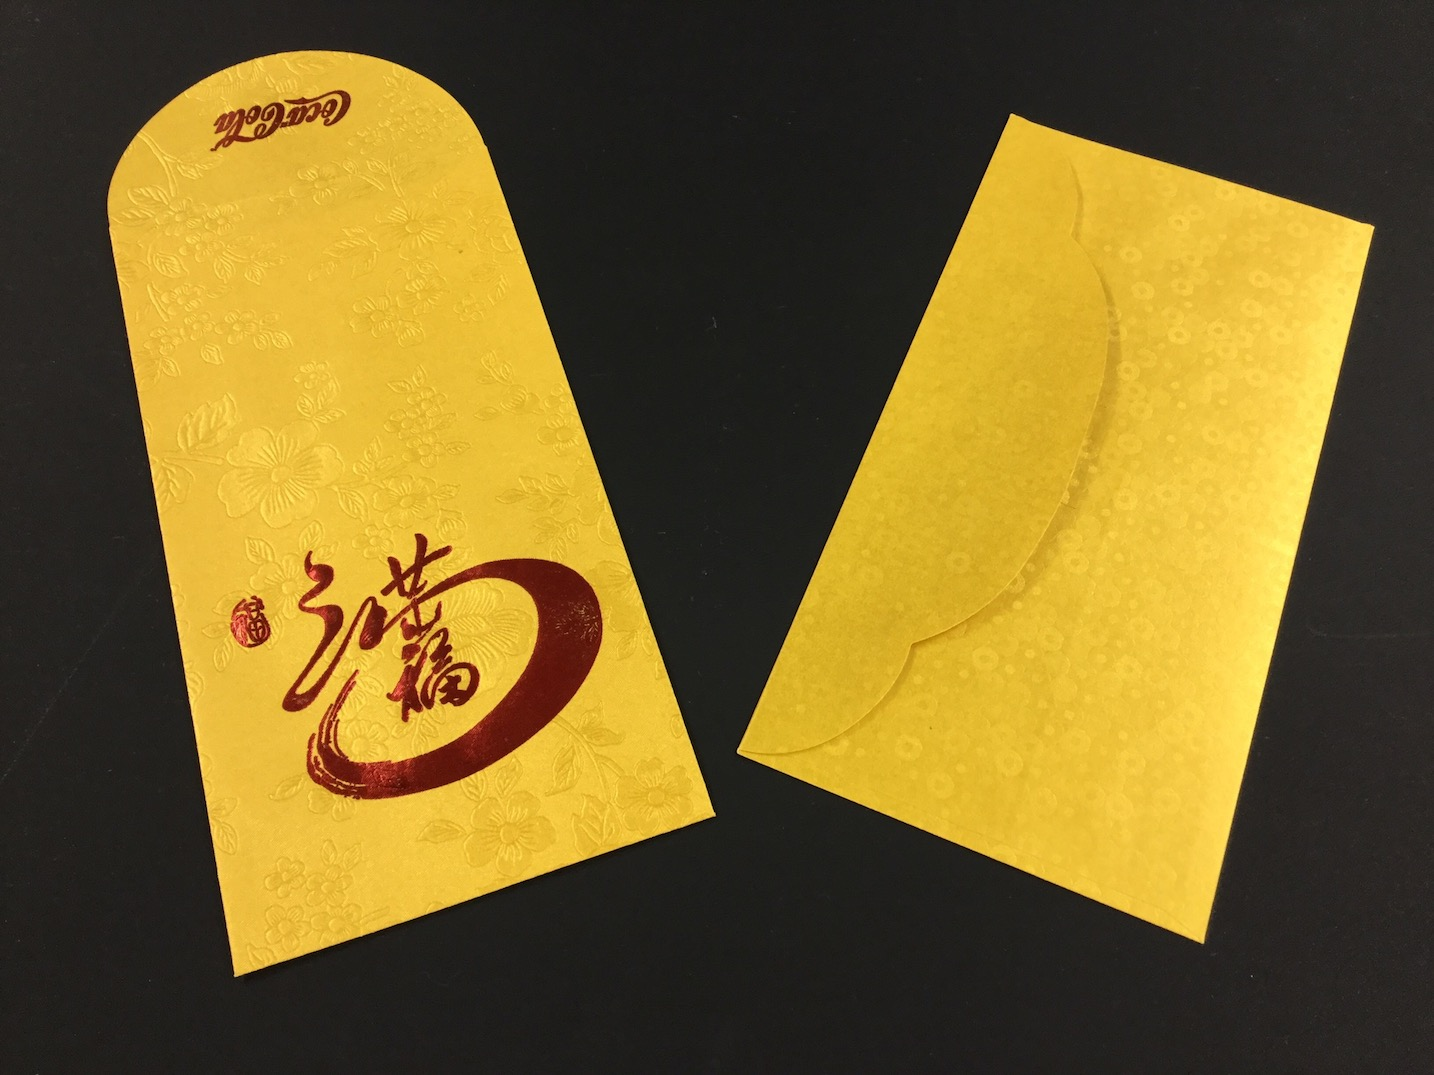 photo of envelope samples